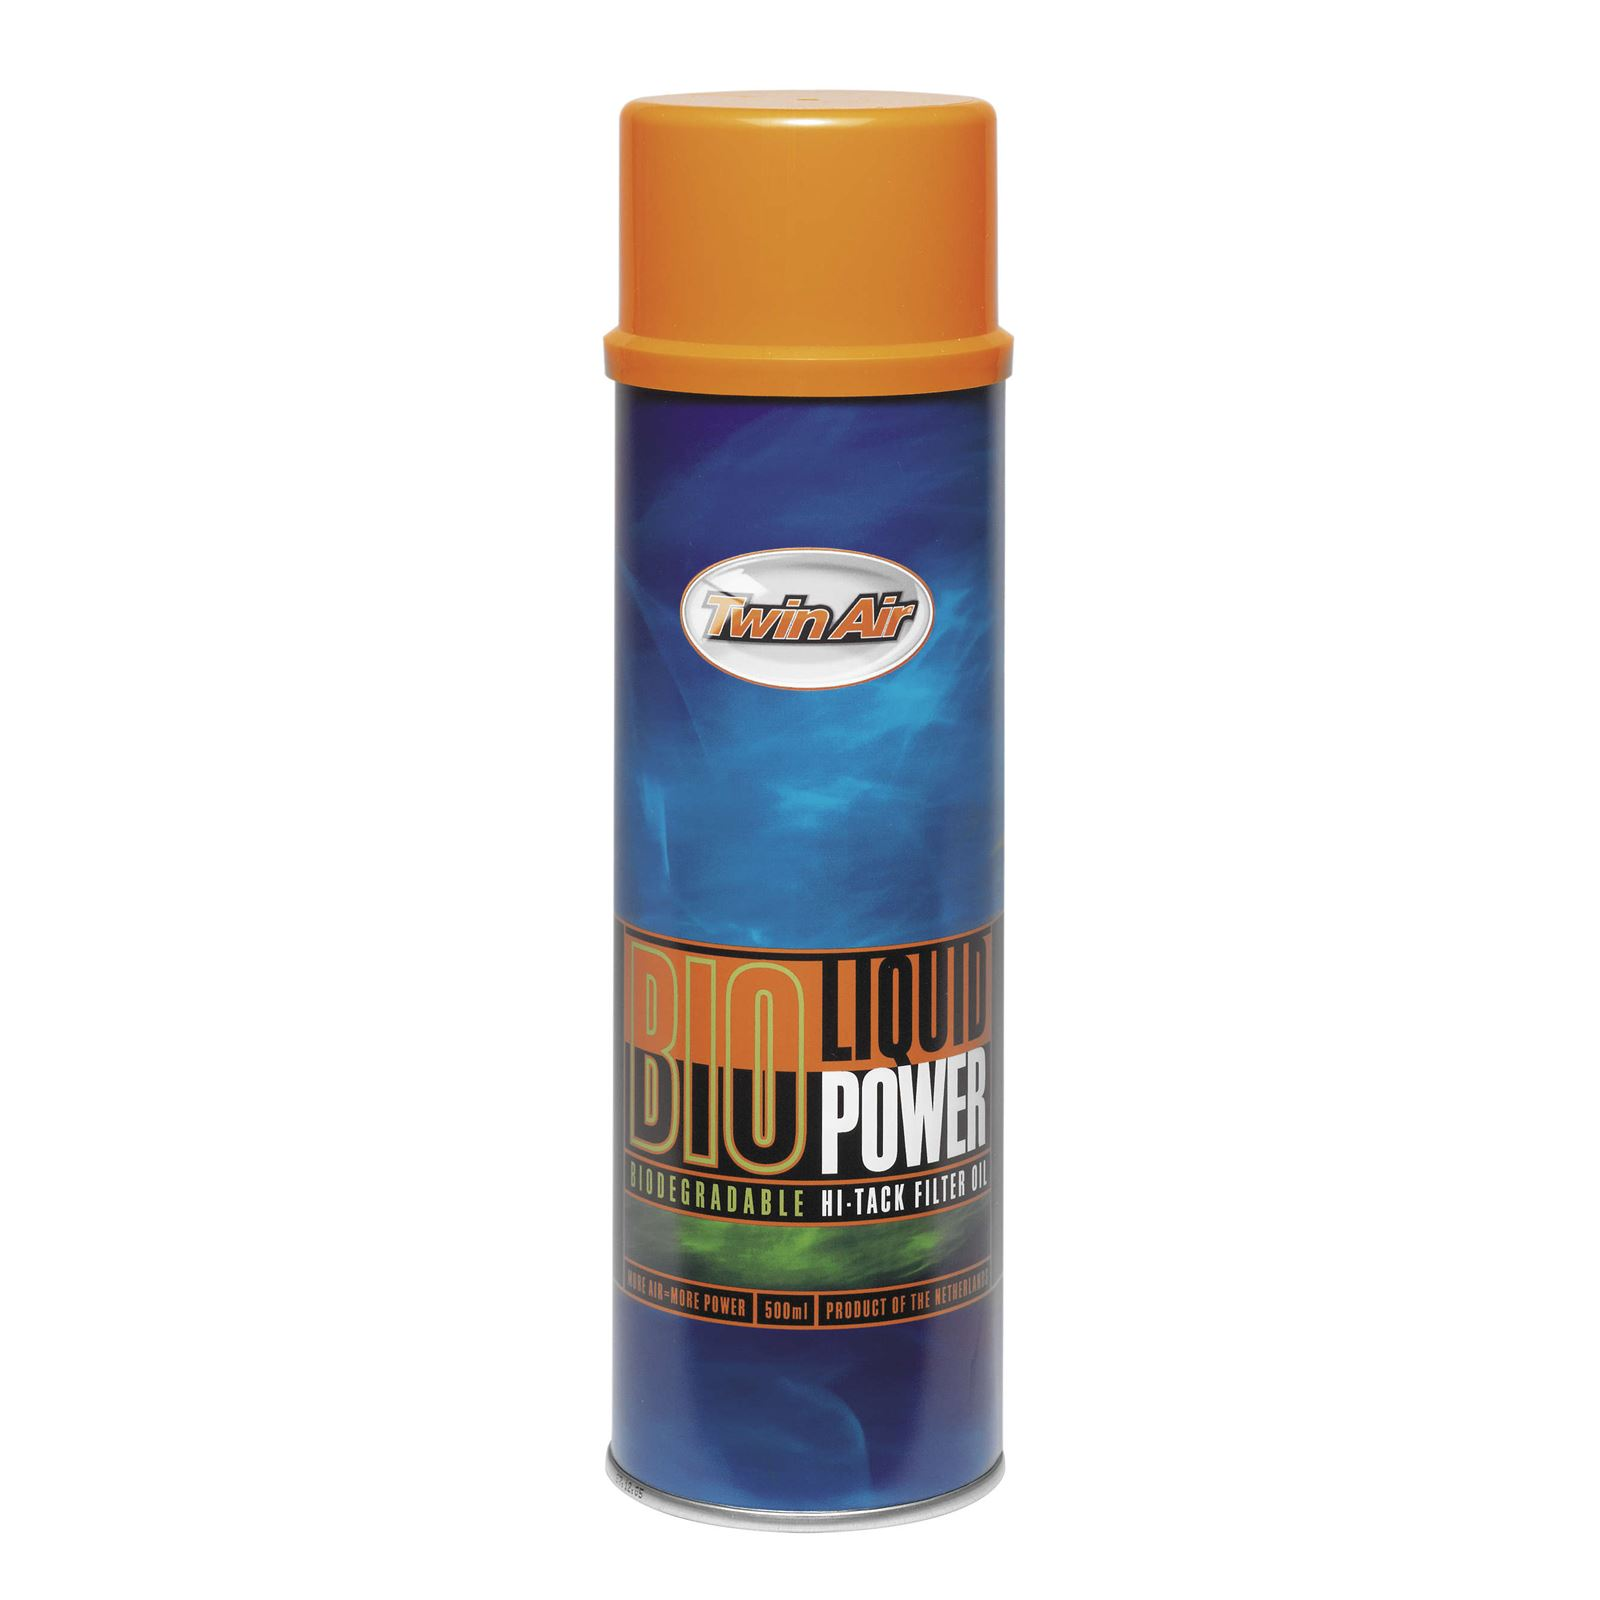 Twin Air Bio Oil/Cleaner